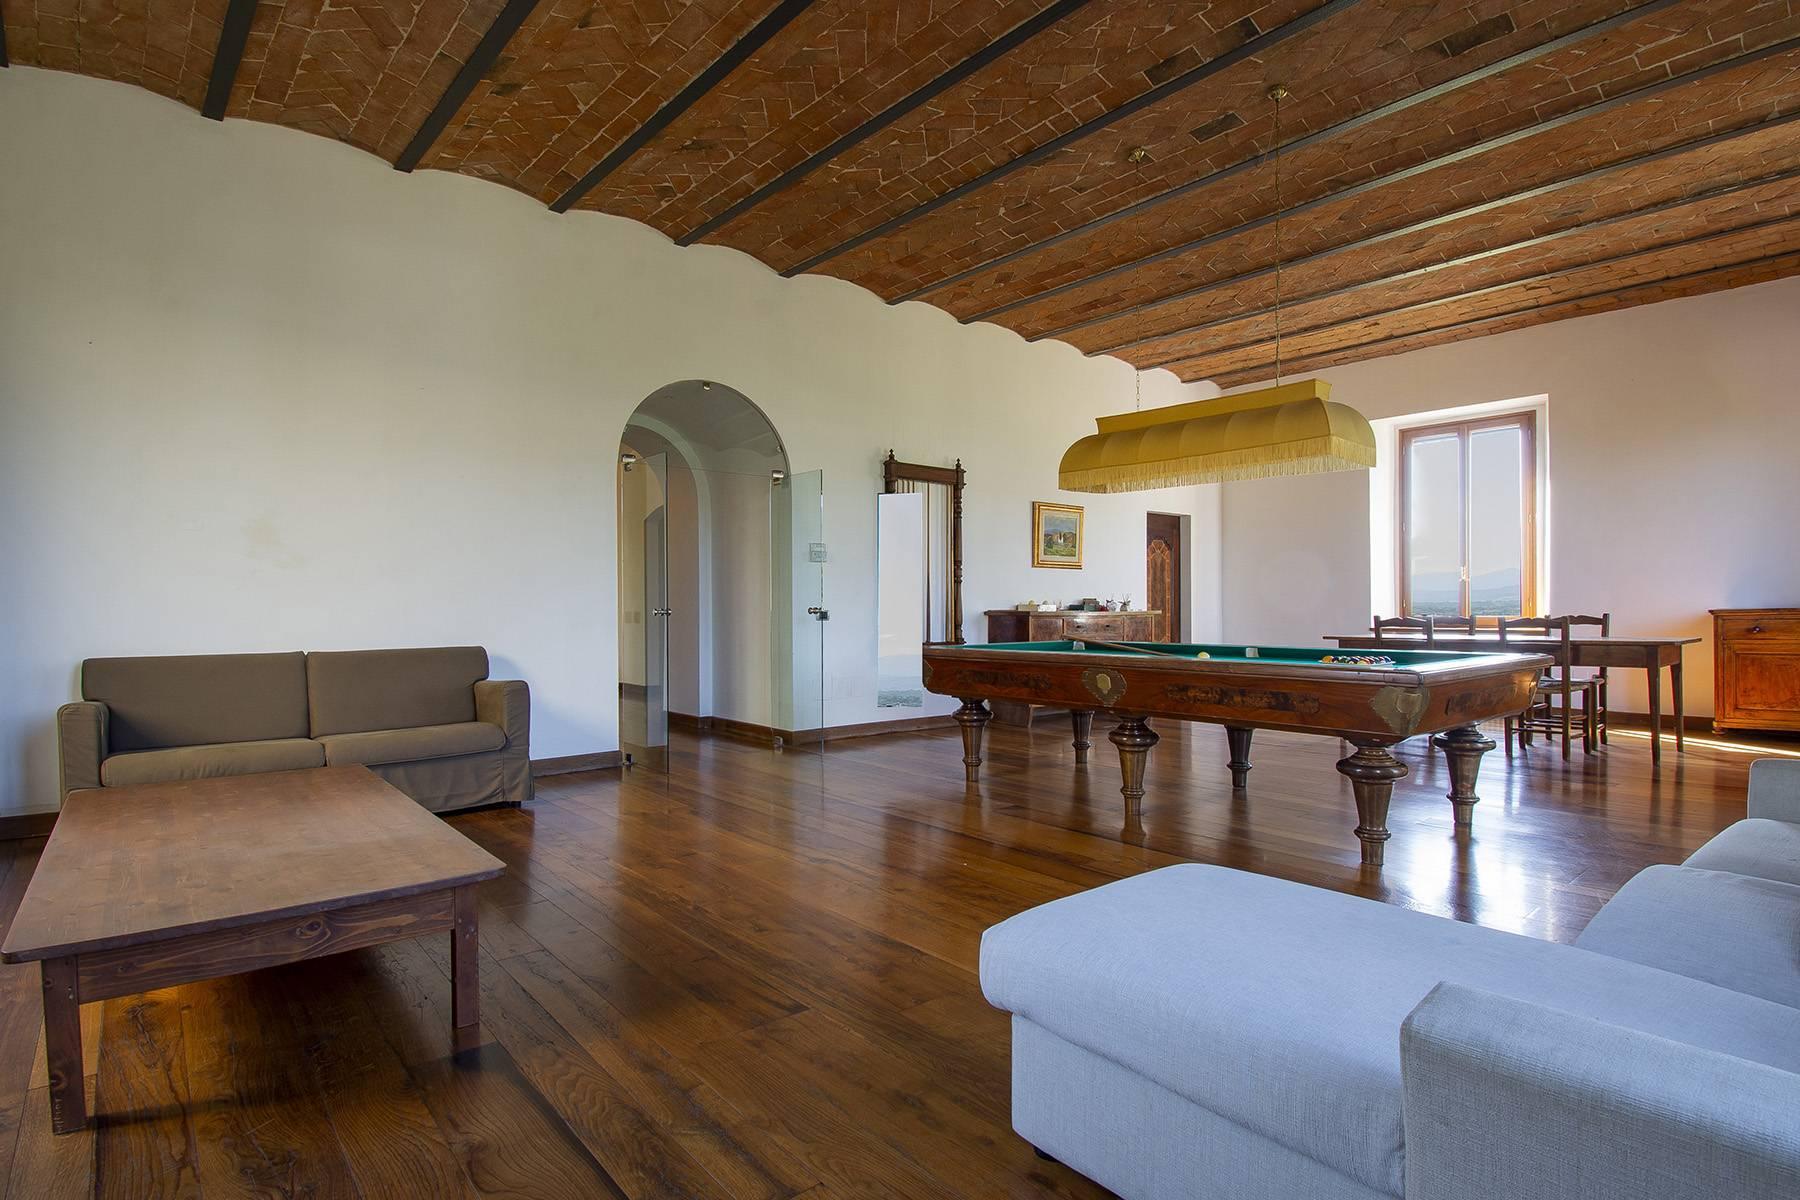 Farmhouse nestled on the Tuscan hills - 9